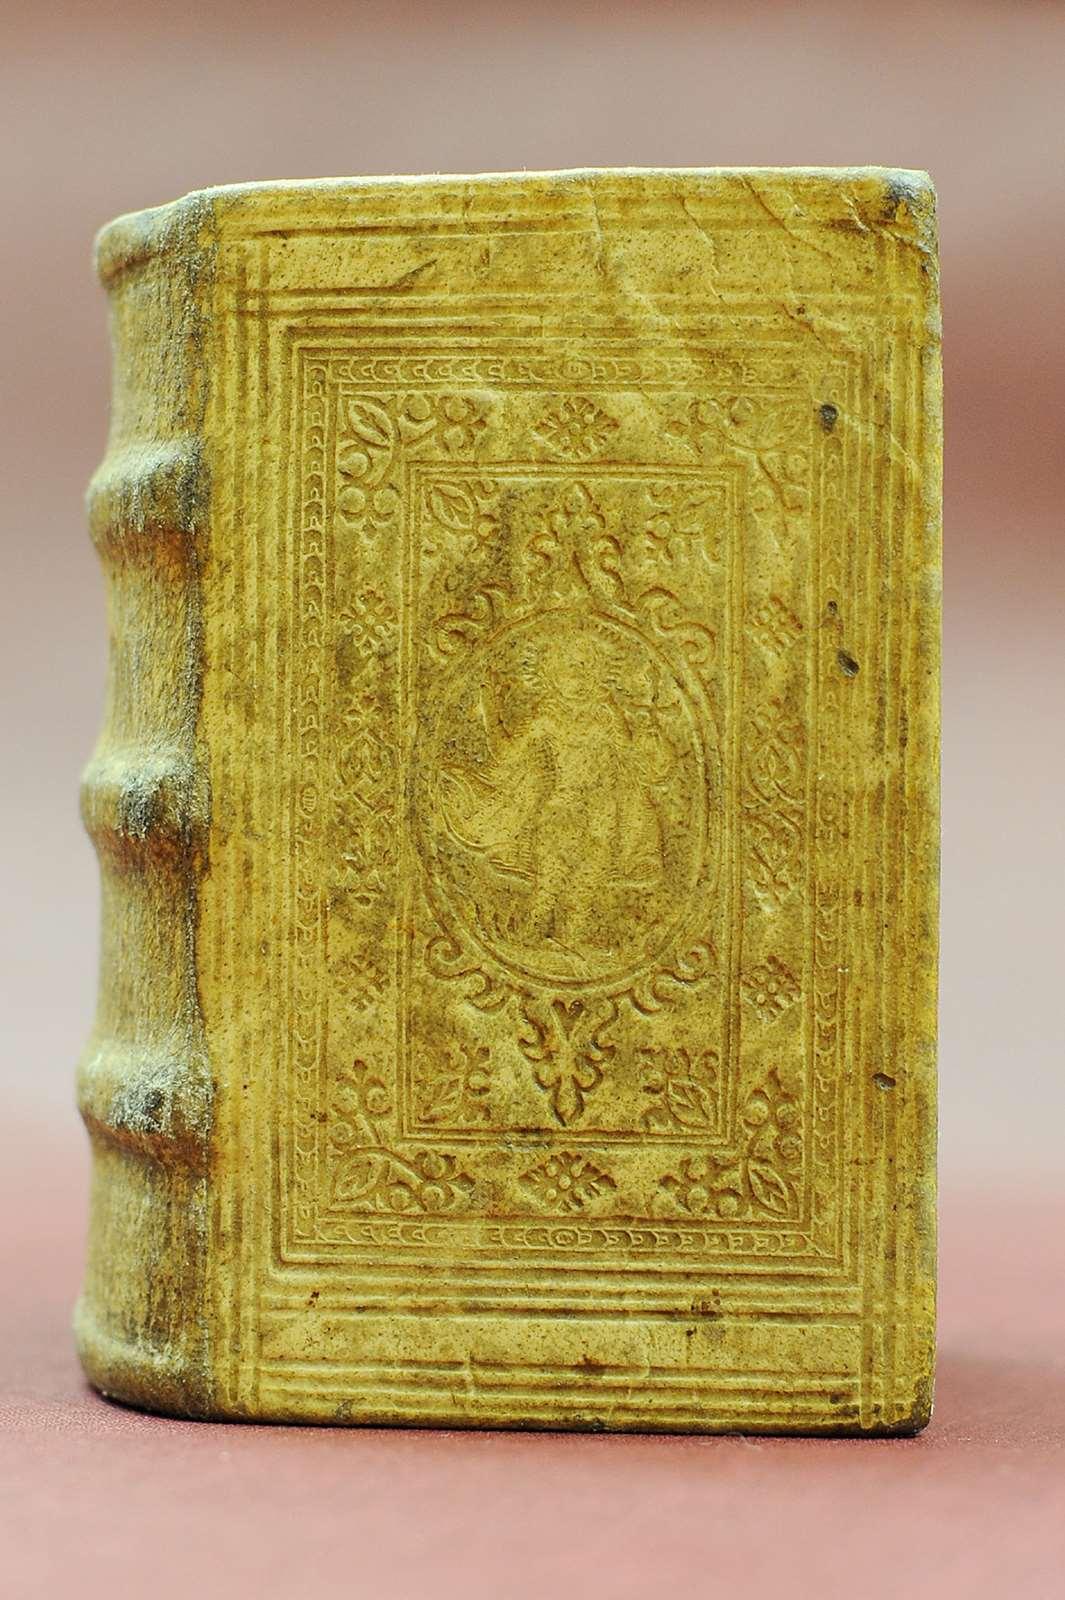 Griechischer Psalter, Straßburg 1524, gedruckt bei W. Köpfel; Foto: Peter Grewer